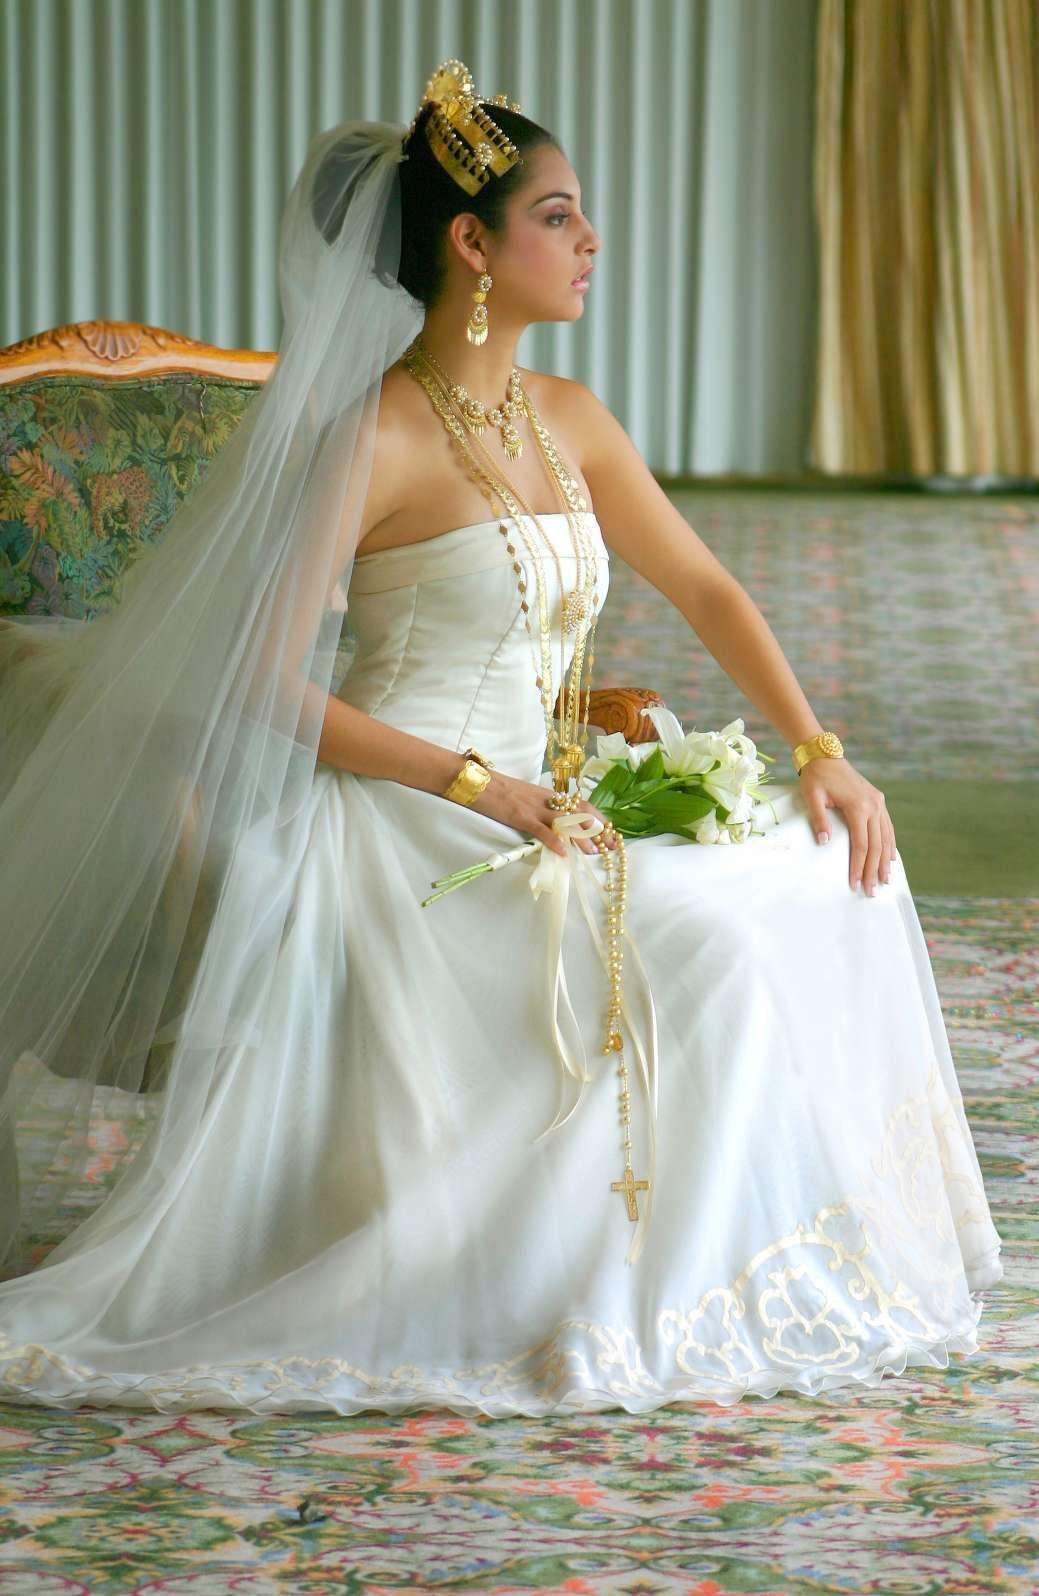 Totally Panama's wedding dress adkerjflk by kamillyanna on